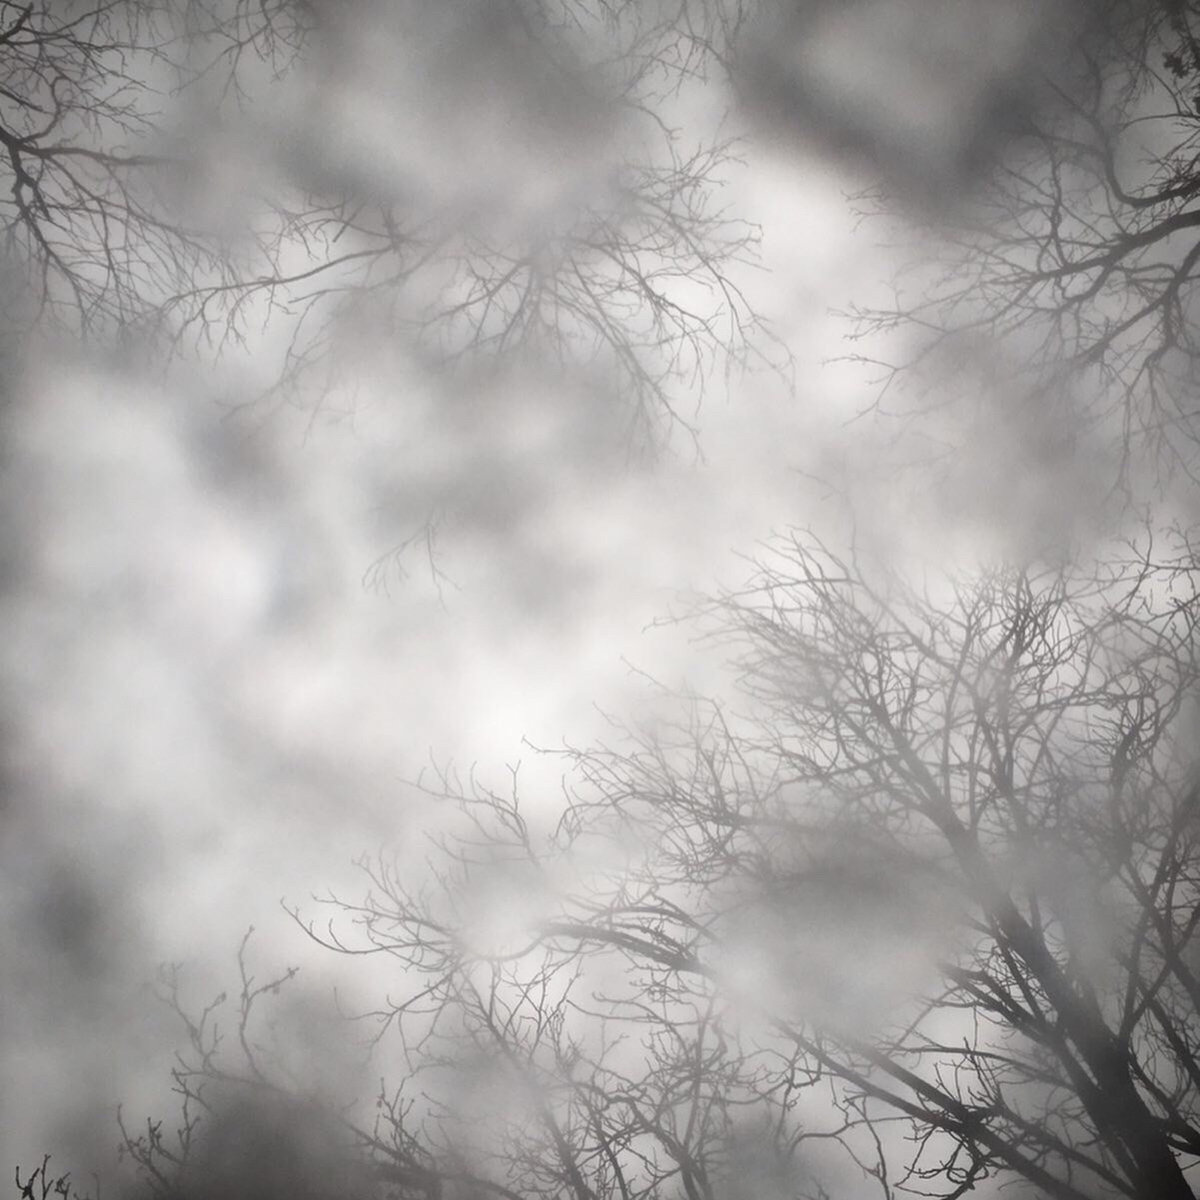 Ian McCuen – Songs of Fleeting Permanence, Vol. III